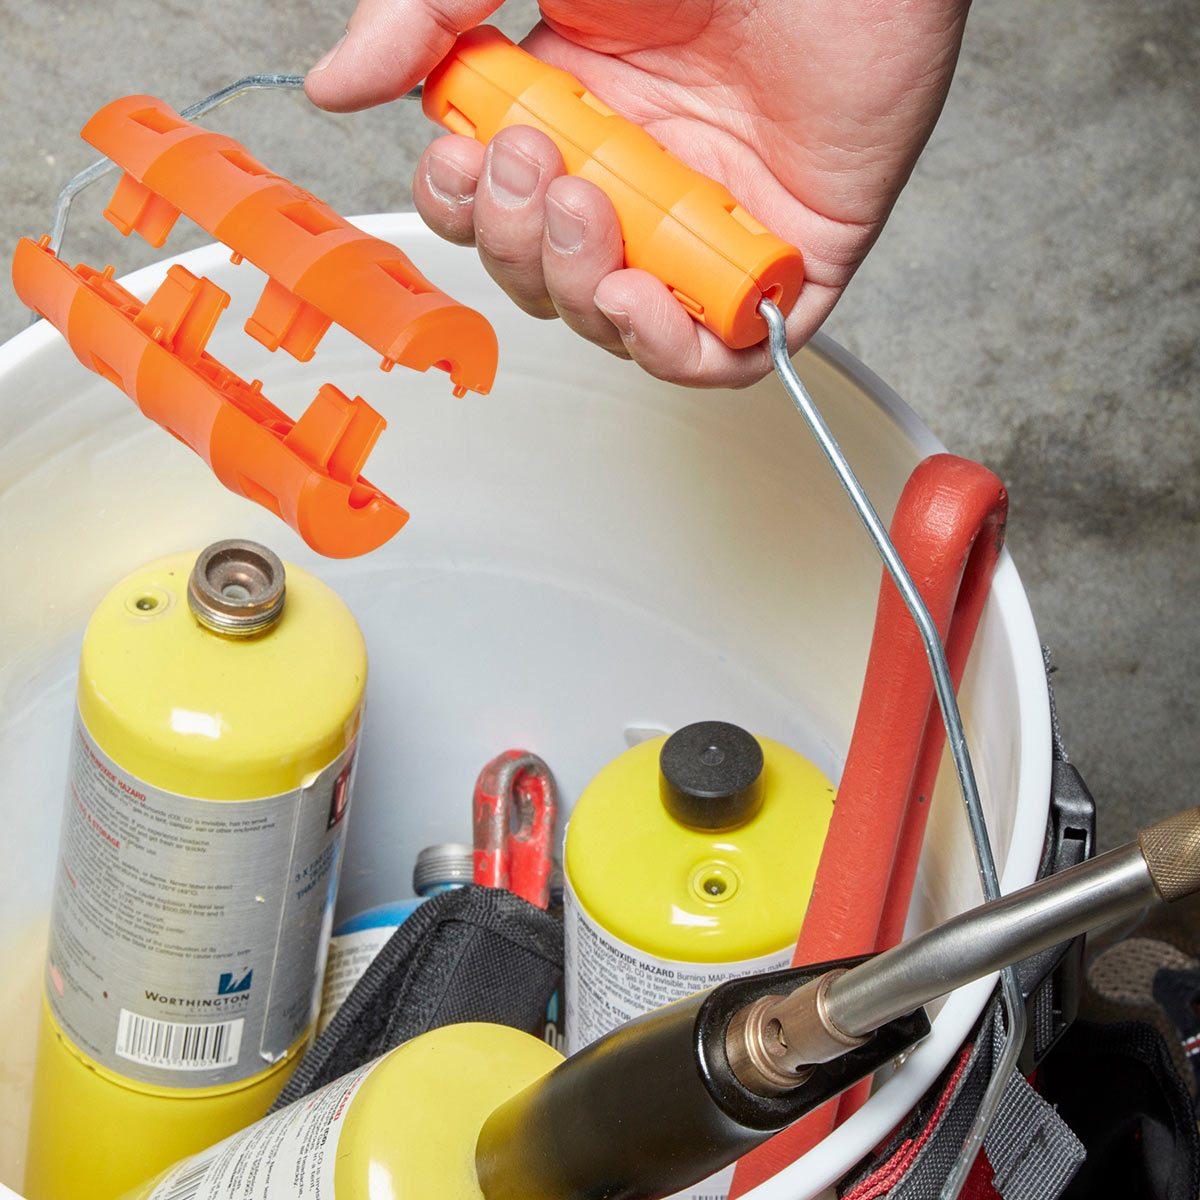 A better bucket handle